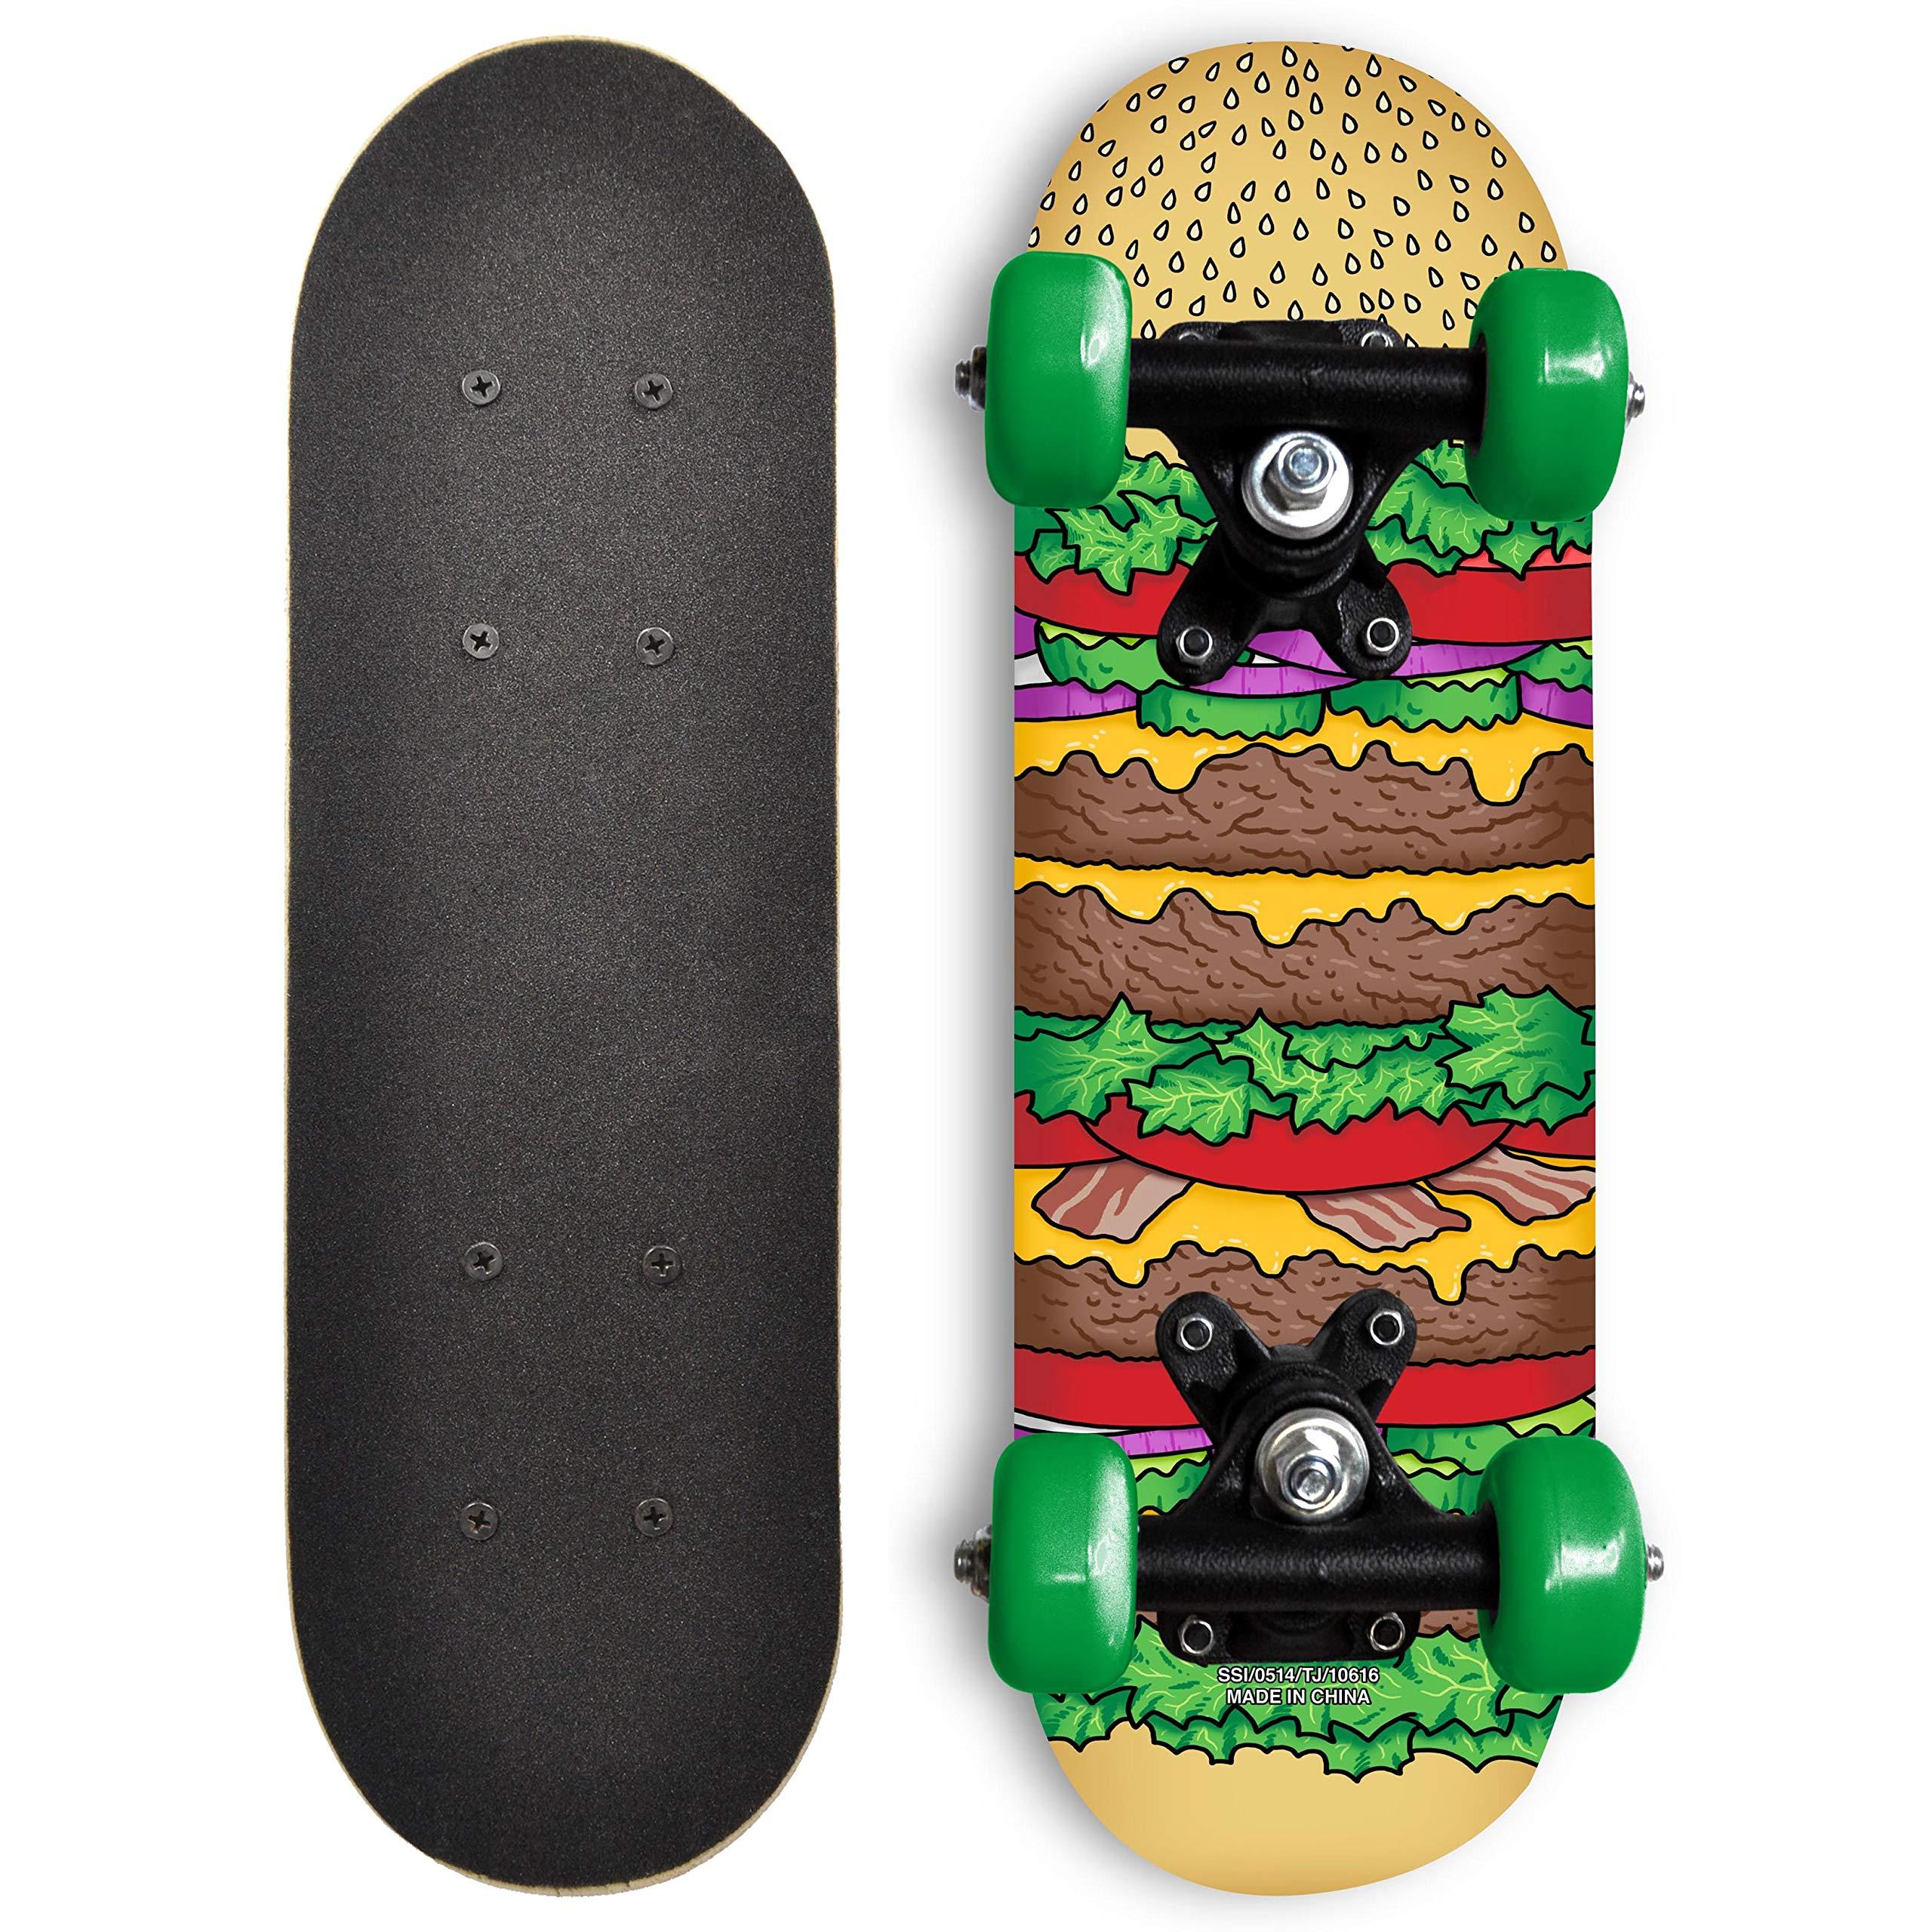 RudeBoyz 17 Inch Mini Wooden Cruiser Graphic Beginner Skateboard (Cheeseburger Design) by RudeBoyz